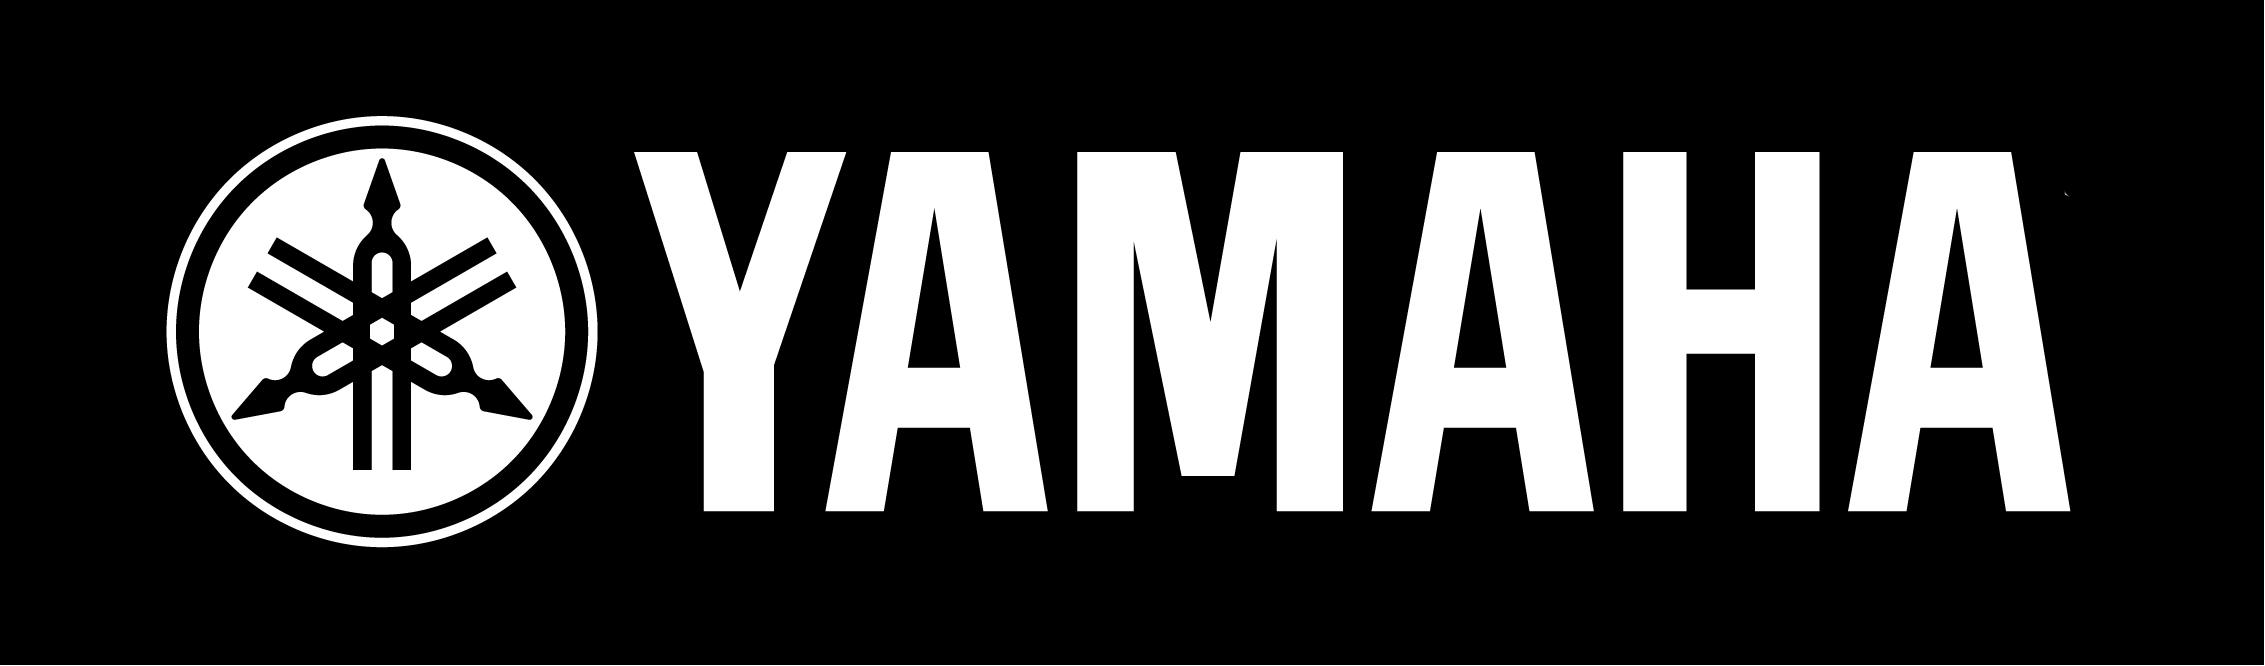 2265x666 Yamaha Advertising Graphics